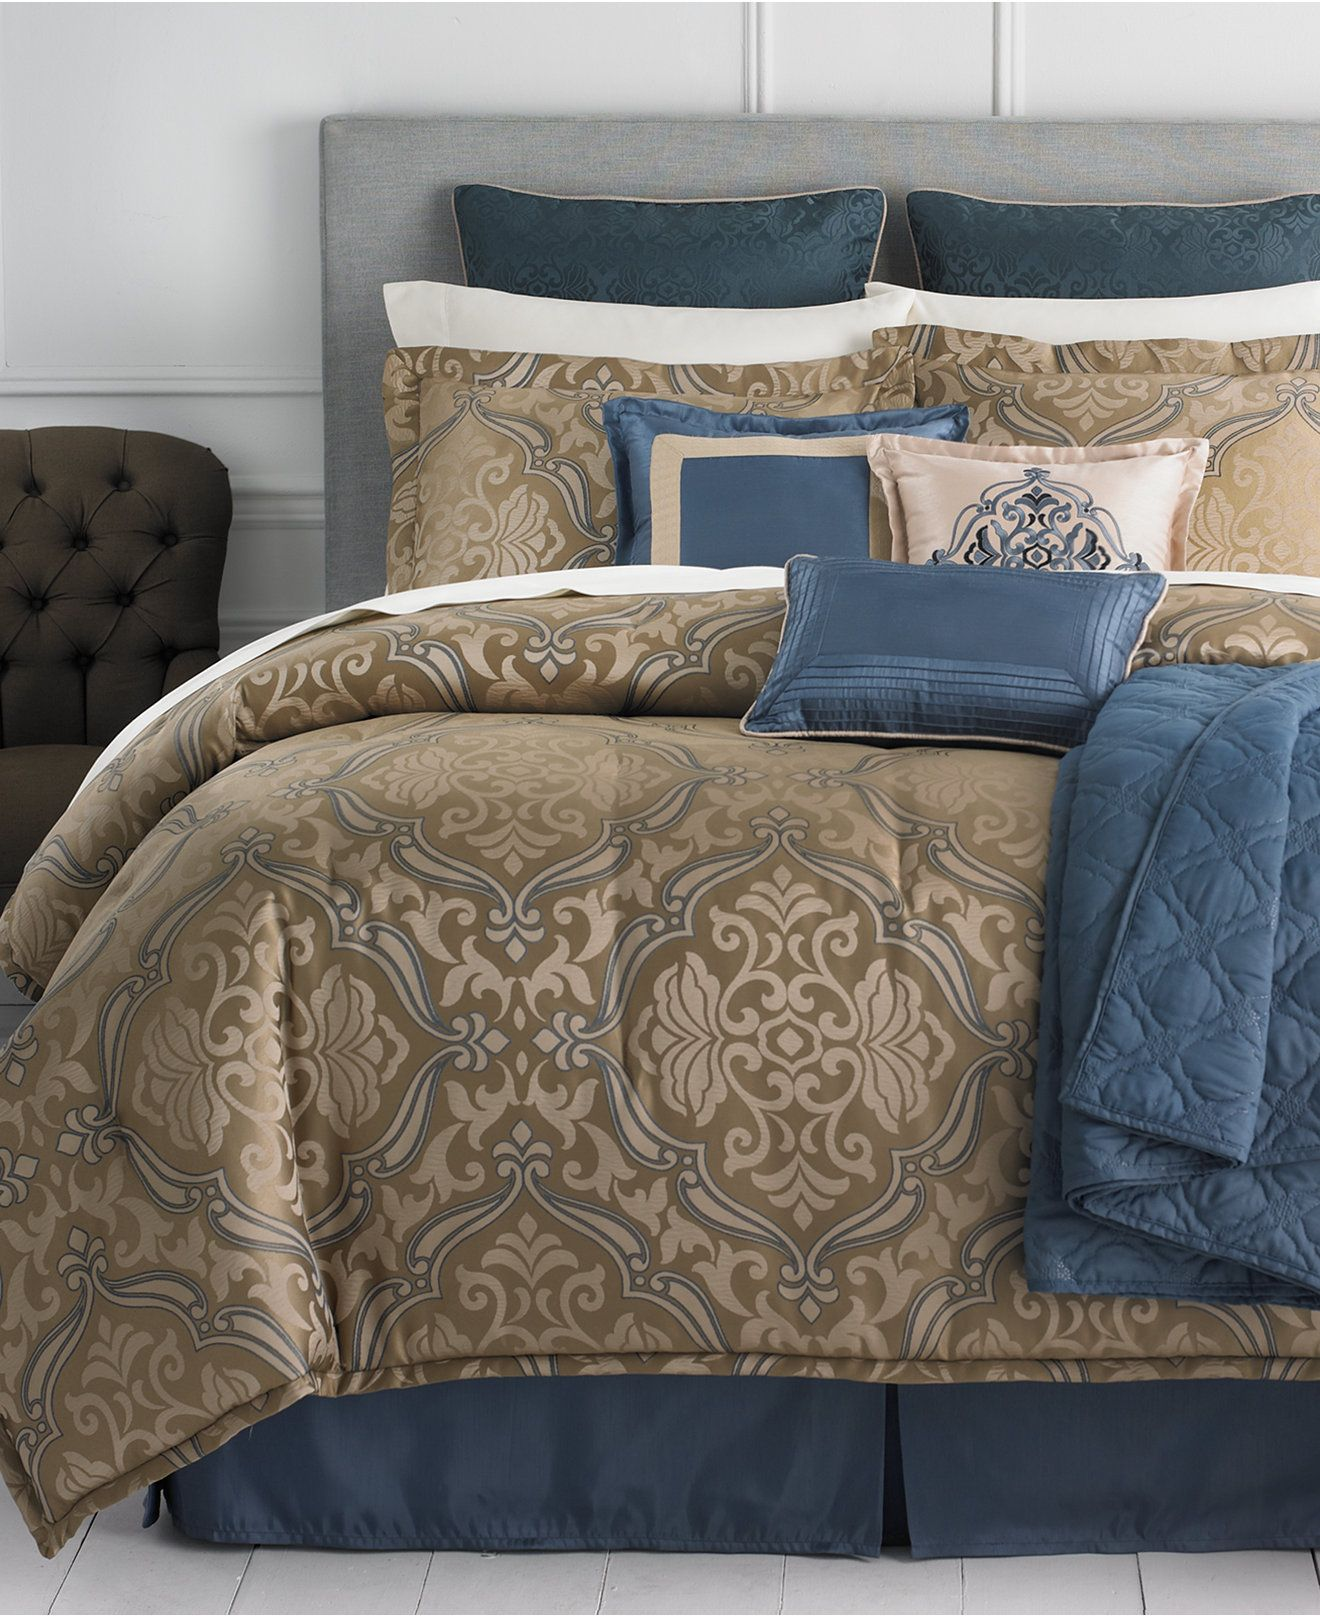 martha stewart collection hampton 22 piece california king comforter set bed in a bag